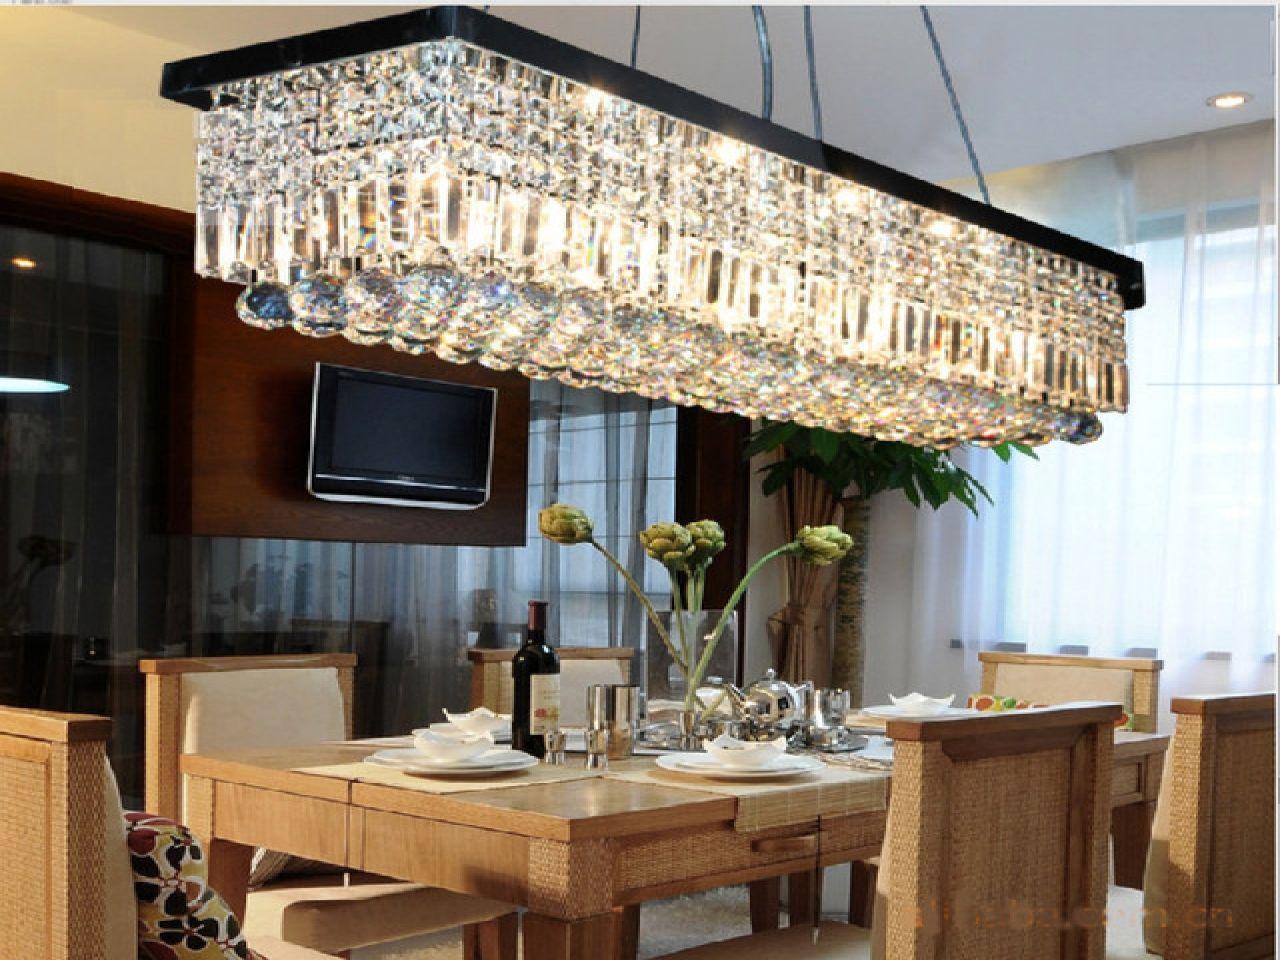 Very Large Dining Room Chandelier In 2019 Rectangular Chandelier Crystal Chandelier Lighting Dining Room Light Fixtures